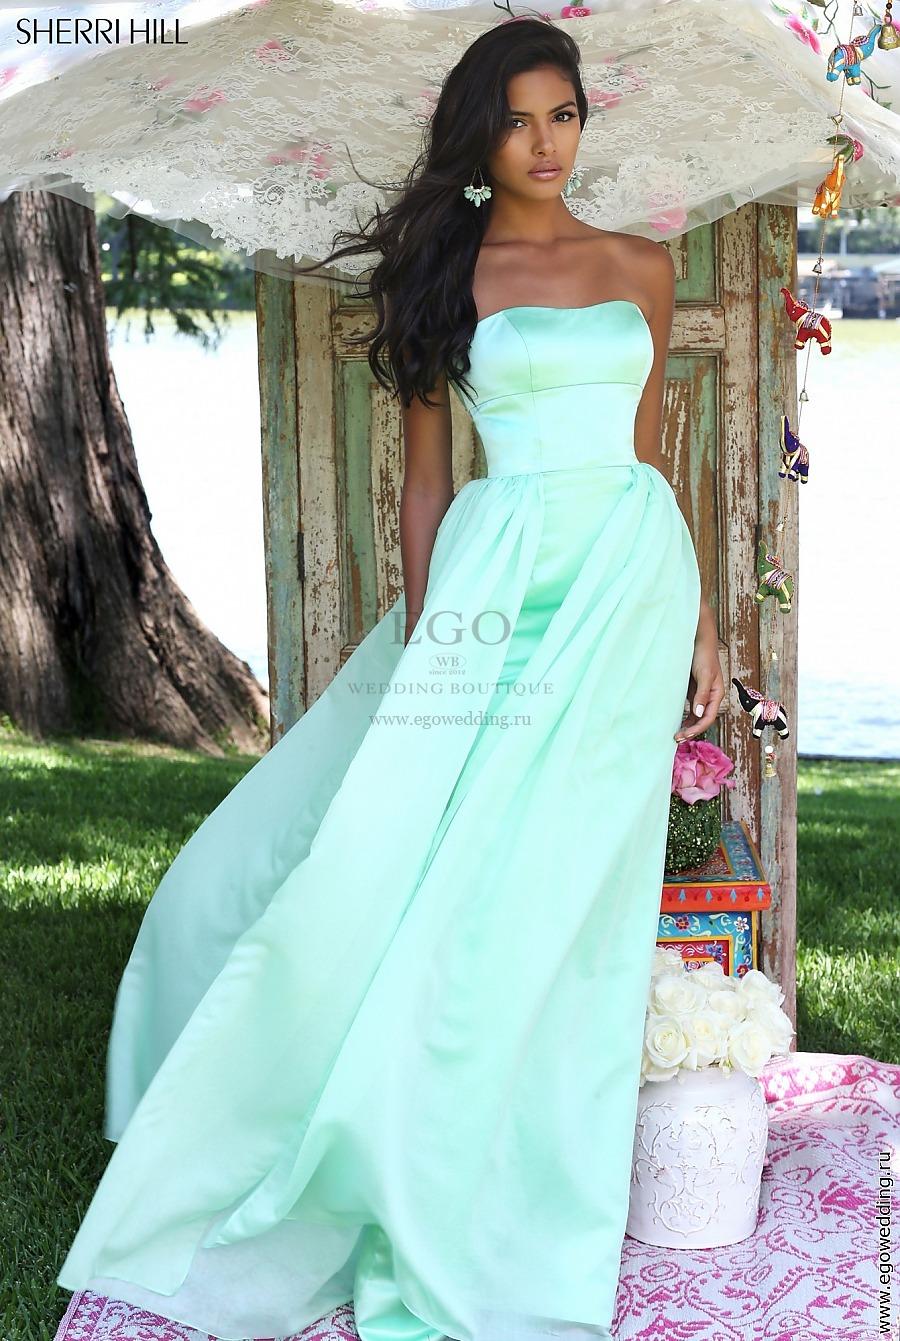 cd4e6edf721 Вечернее платье американского бренда Sherri Hill нежно-мятного цвета.